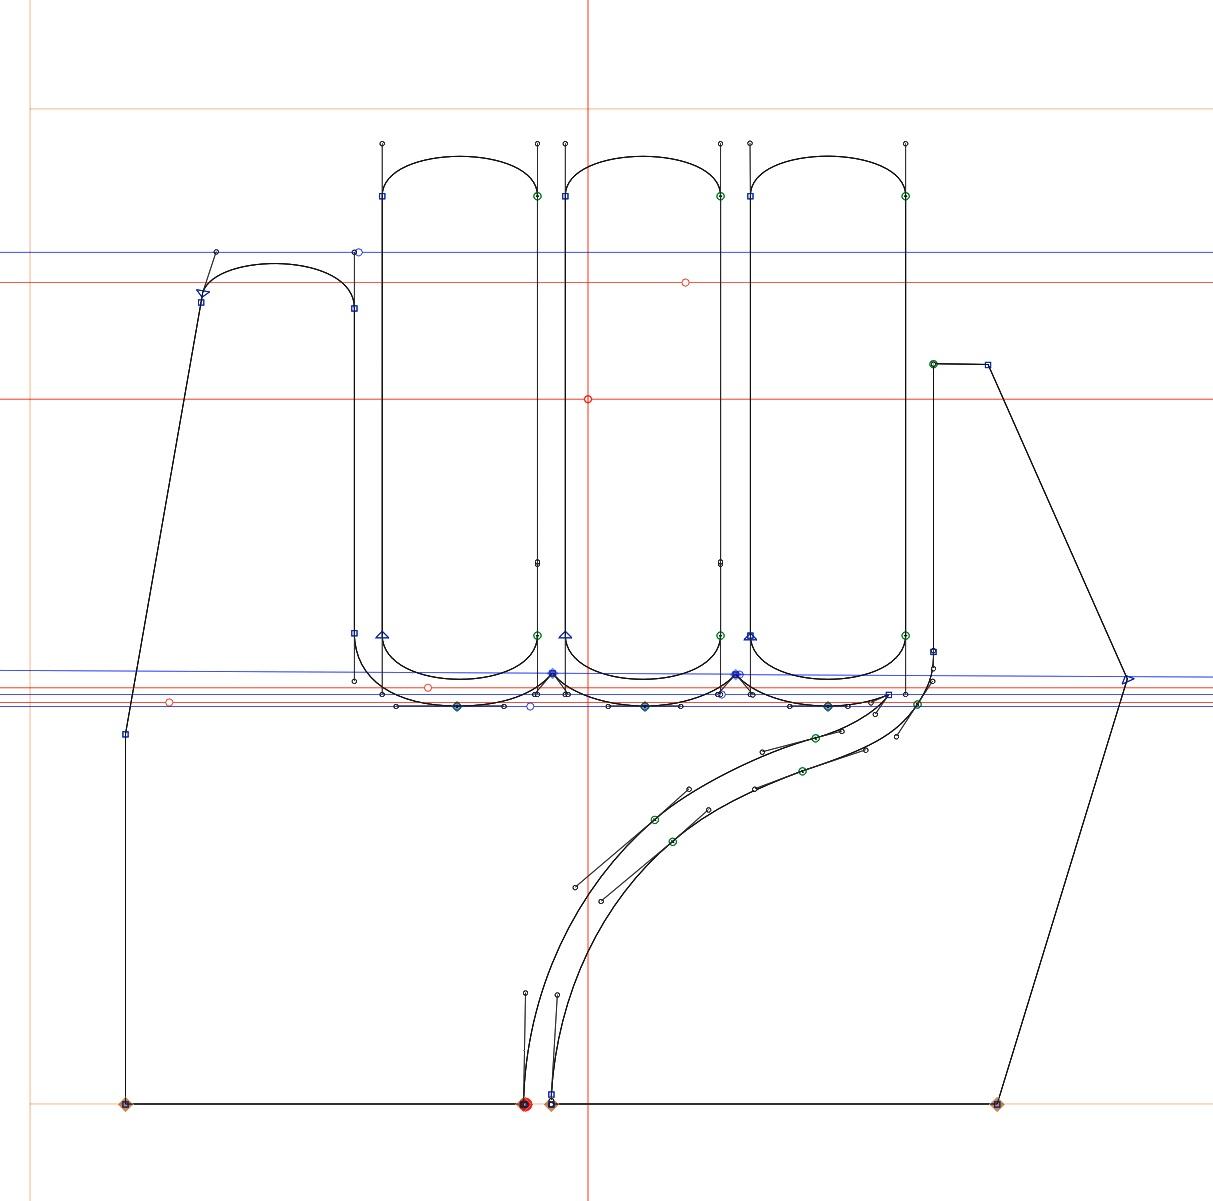 Drawn in  GLYPHS  typepography program. Letter M